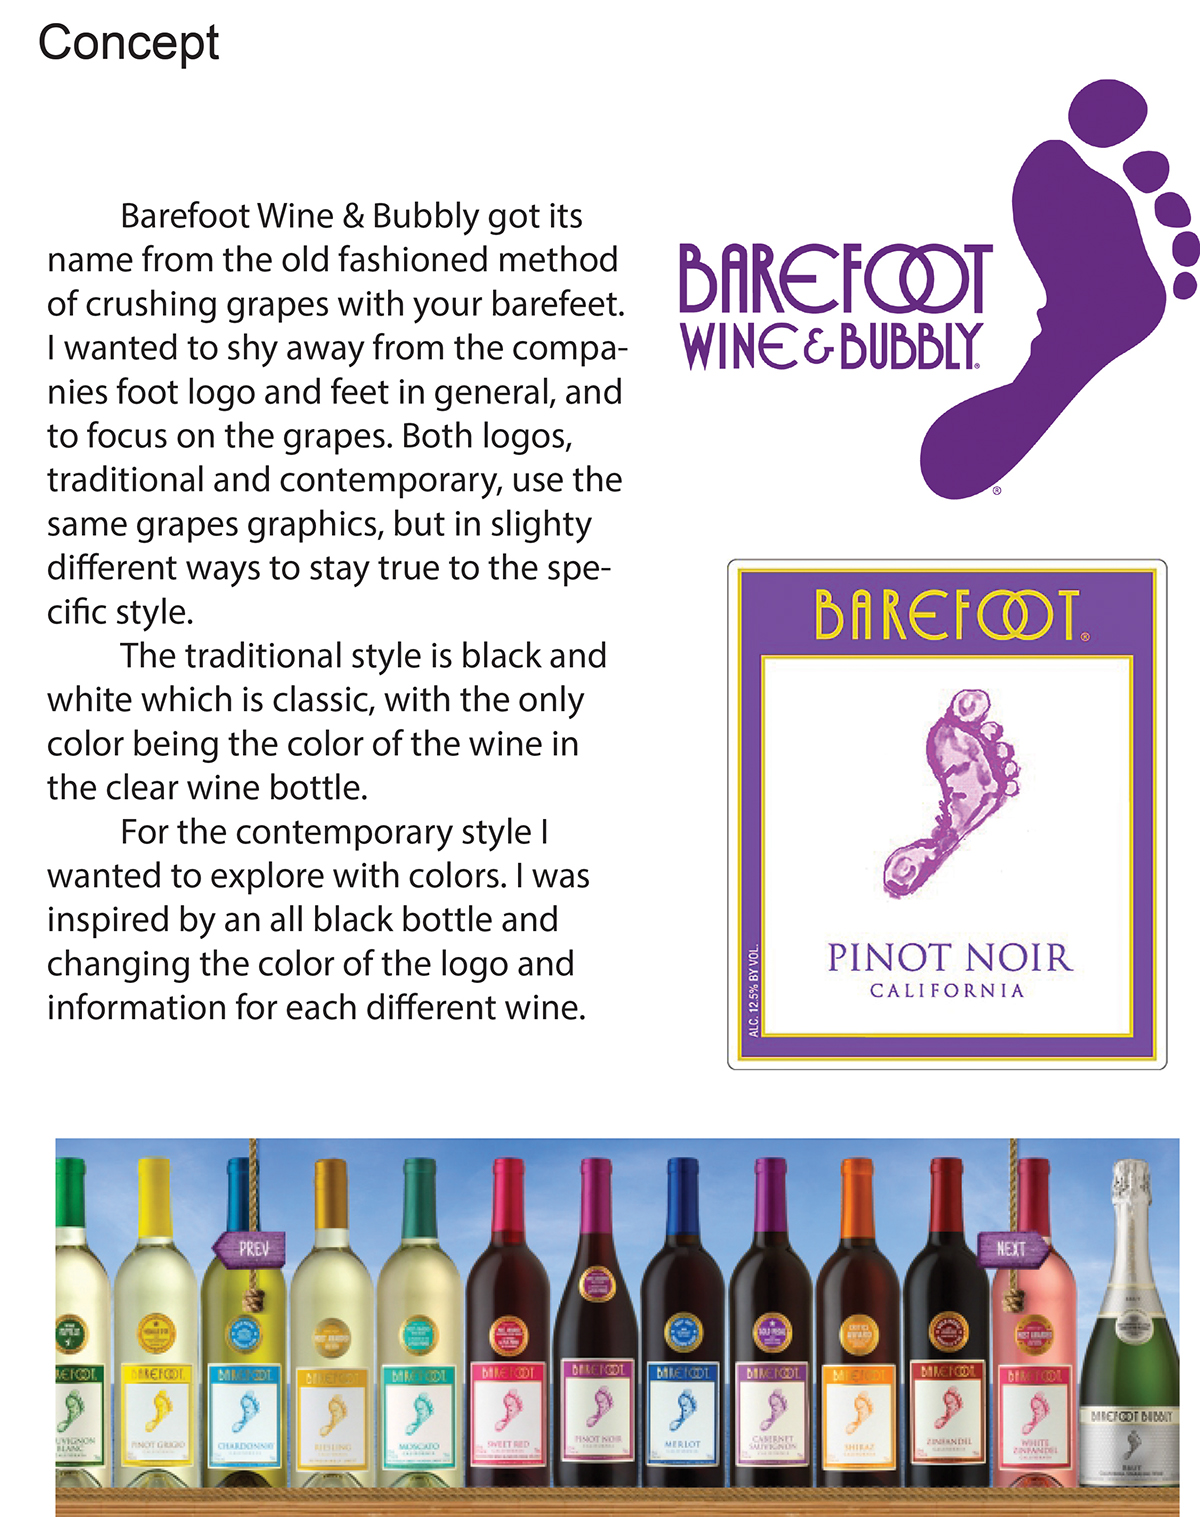 Barefoot Wine Label : barefoot, label, Label, Design-Barefoot, Behance